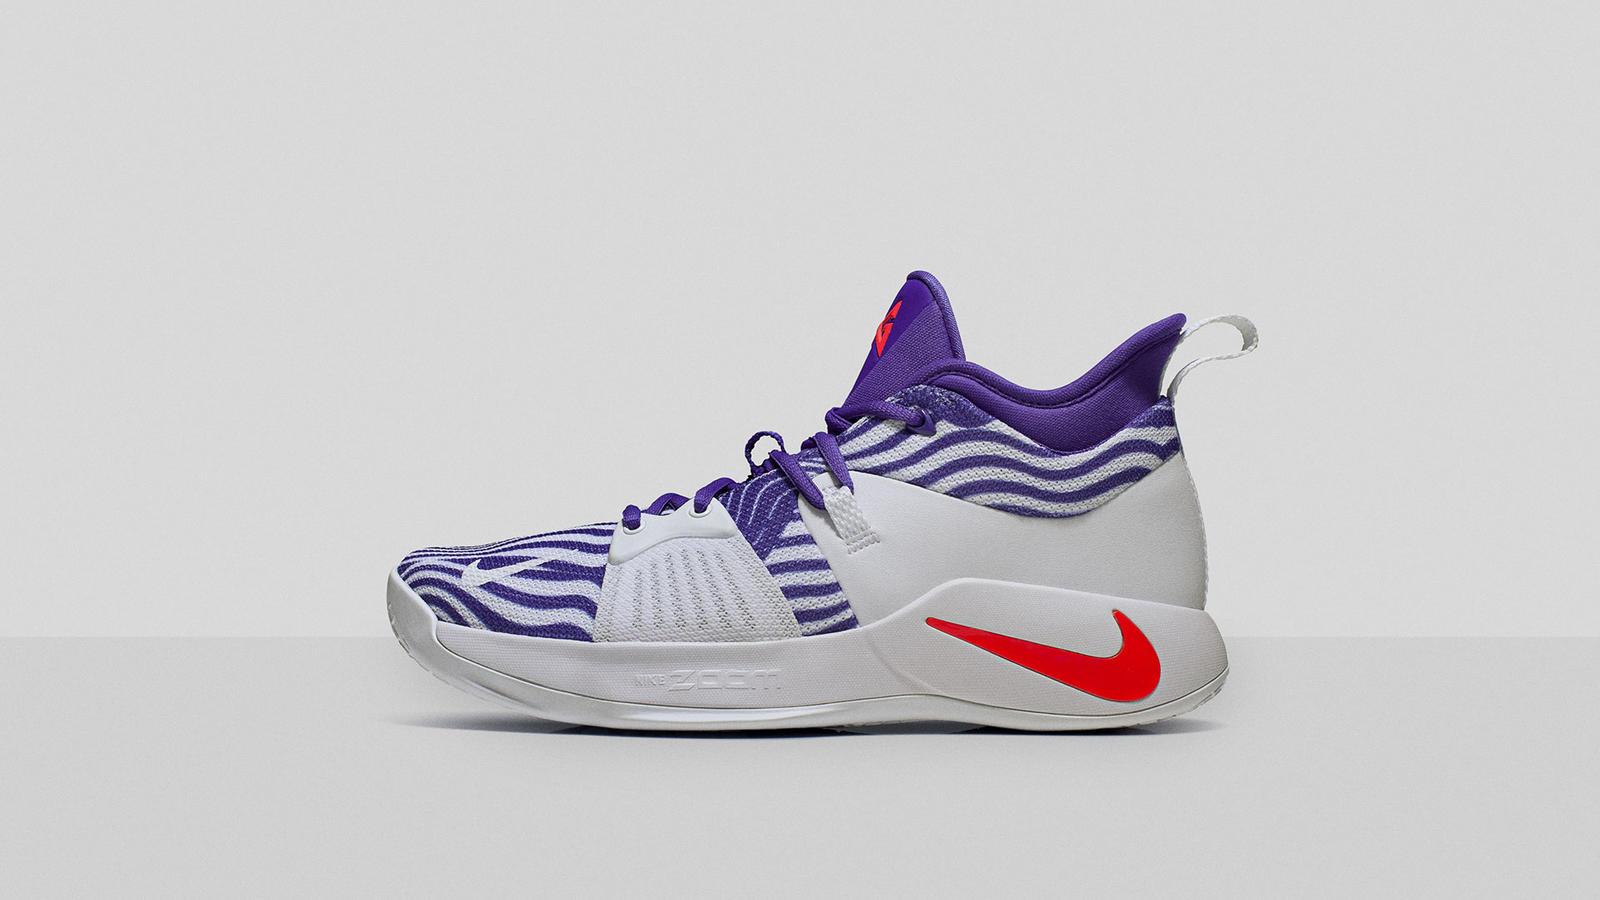 Nike PG 2 2018 WNBA All-Star Game PE Collection